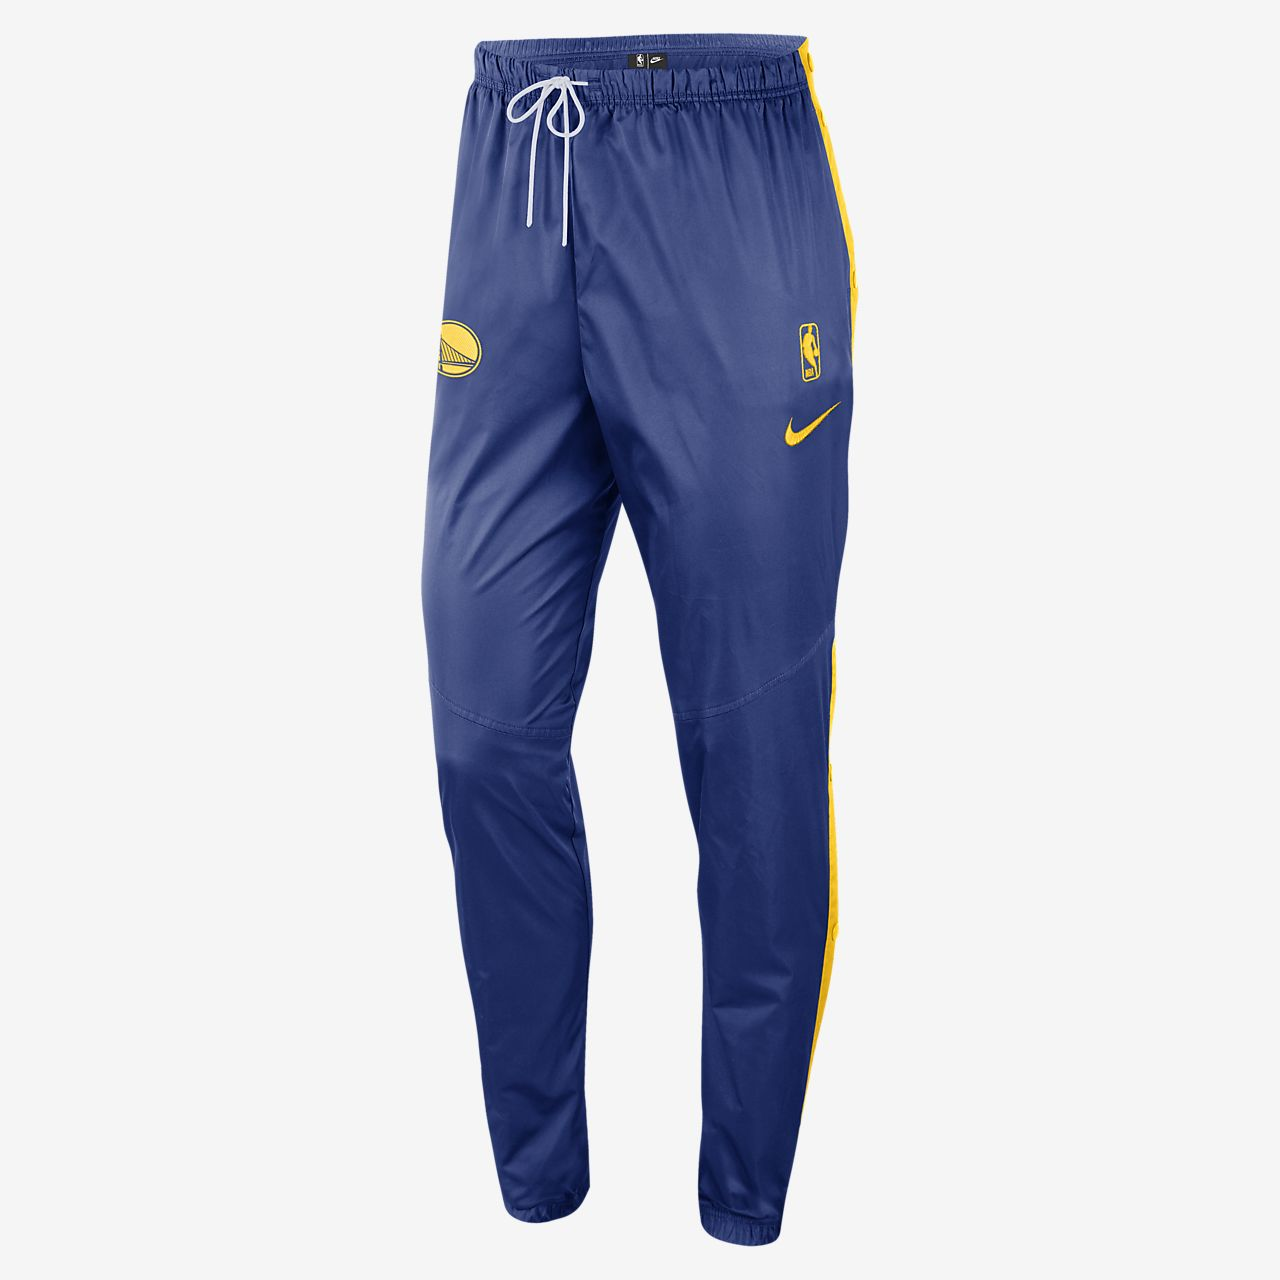 Golden State Warriors Nike NBA-Hose für Damen